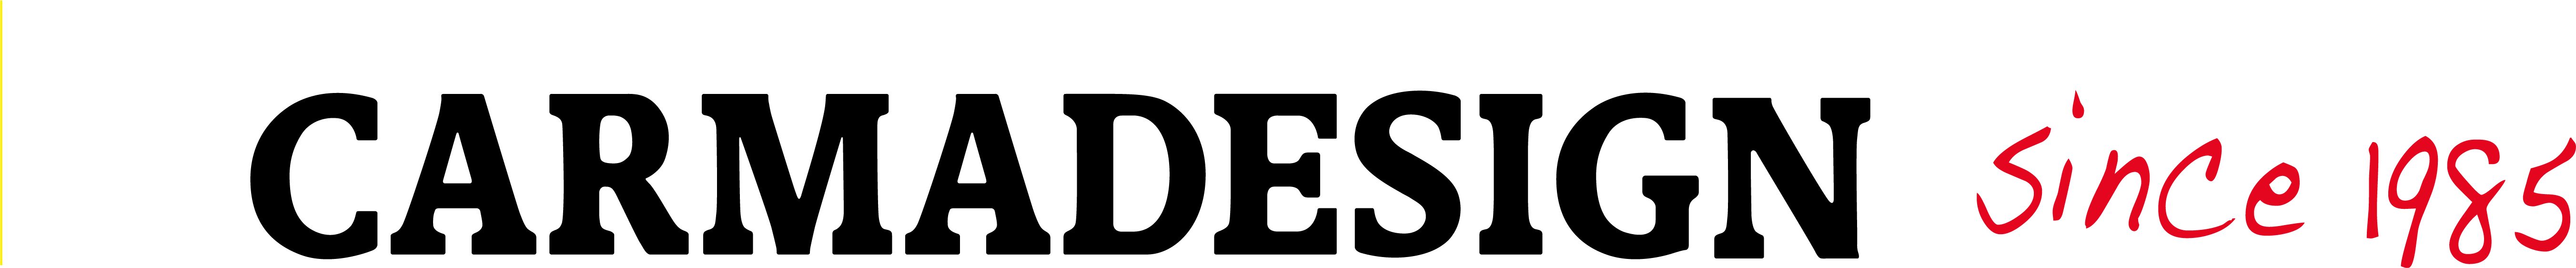 CARMADESIGN